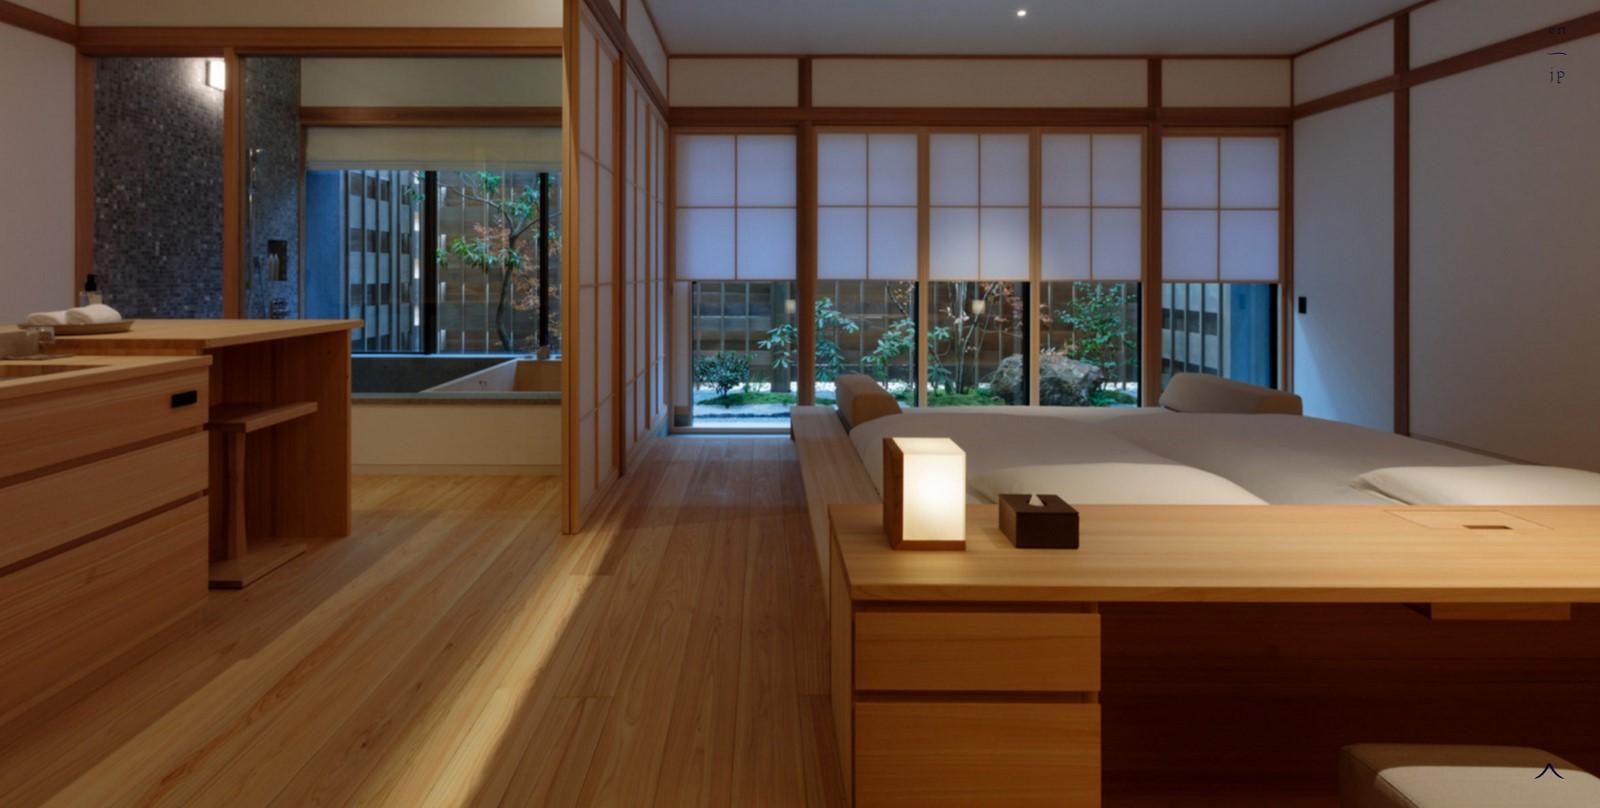 Azumi Setoda, Ikuchijima, Japan - Sheet2